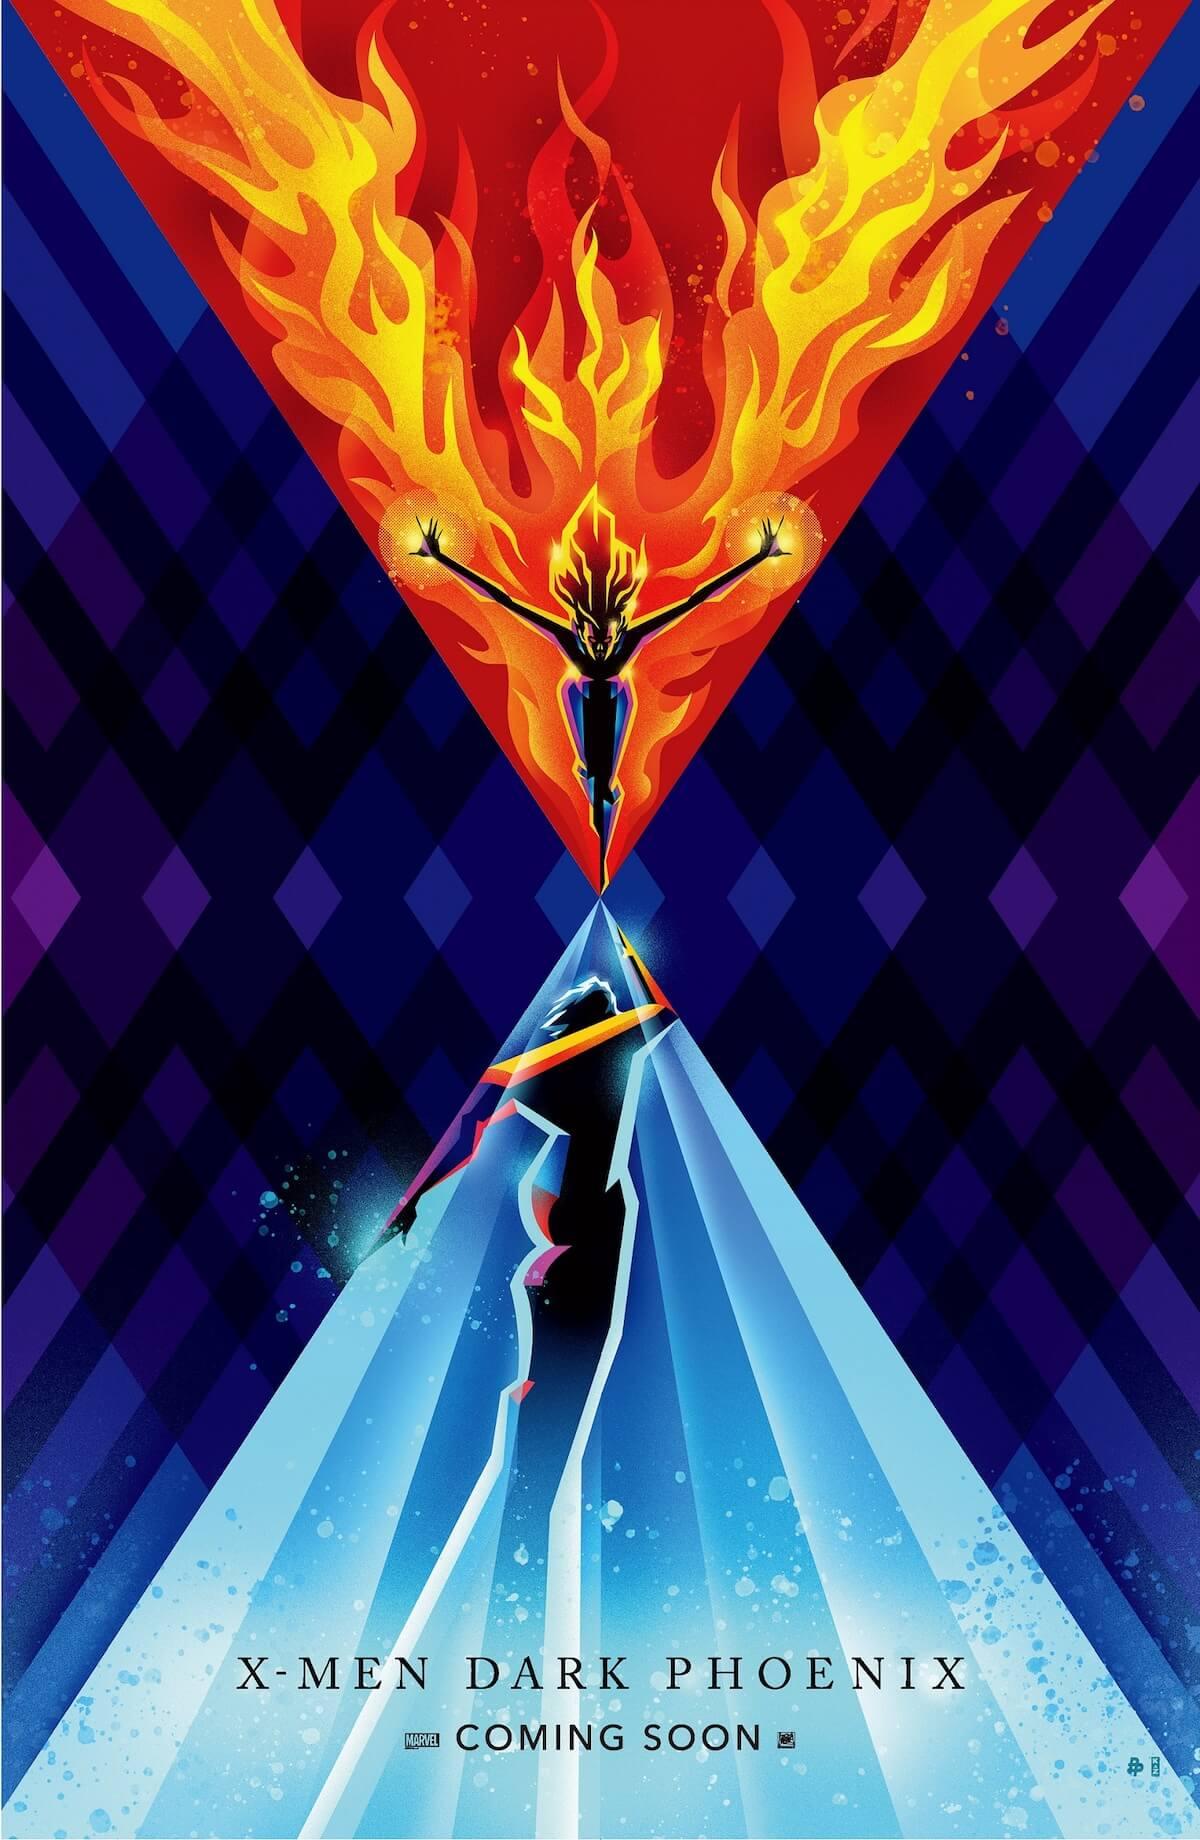 『X-MEN:ダーク・フェニックス』公開記念イベント<XーMEN DAY>が開催!ジーン役ソフィー・ターナーの特別映像解禁 film190517_xmenday_7